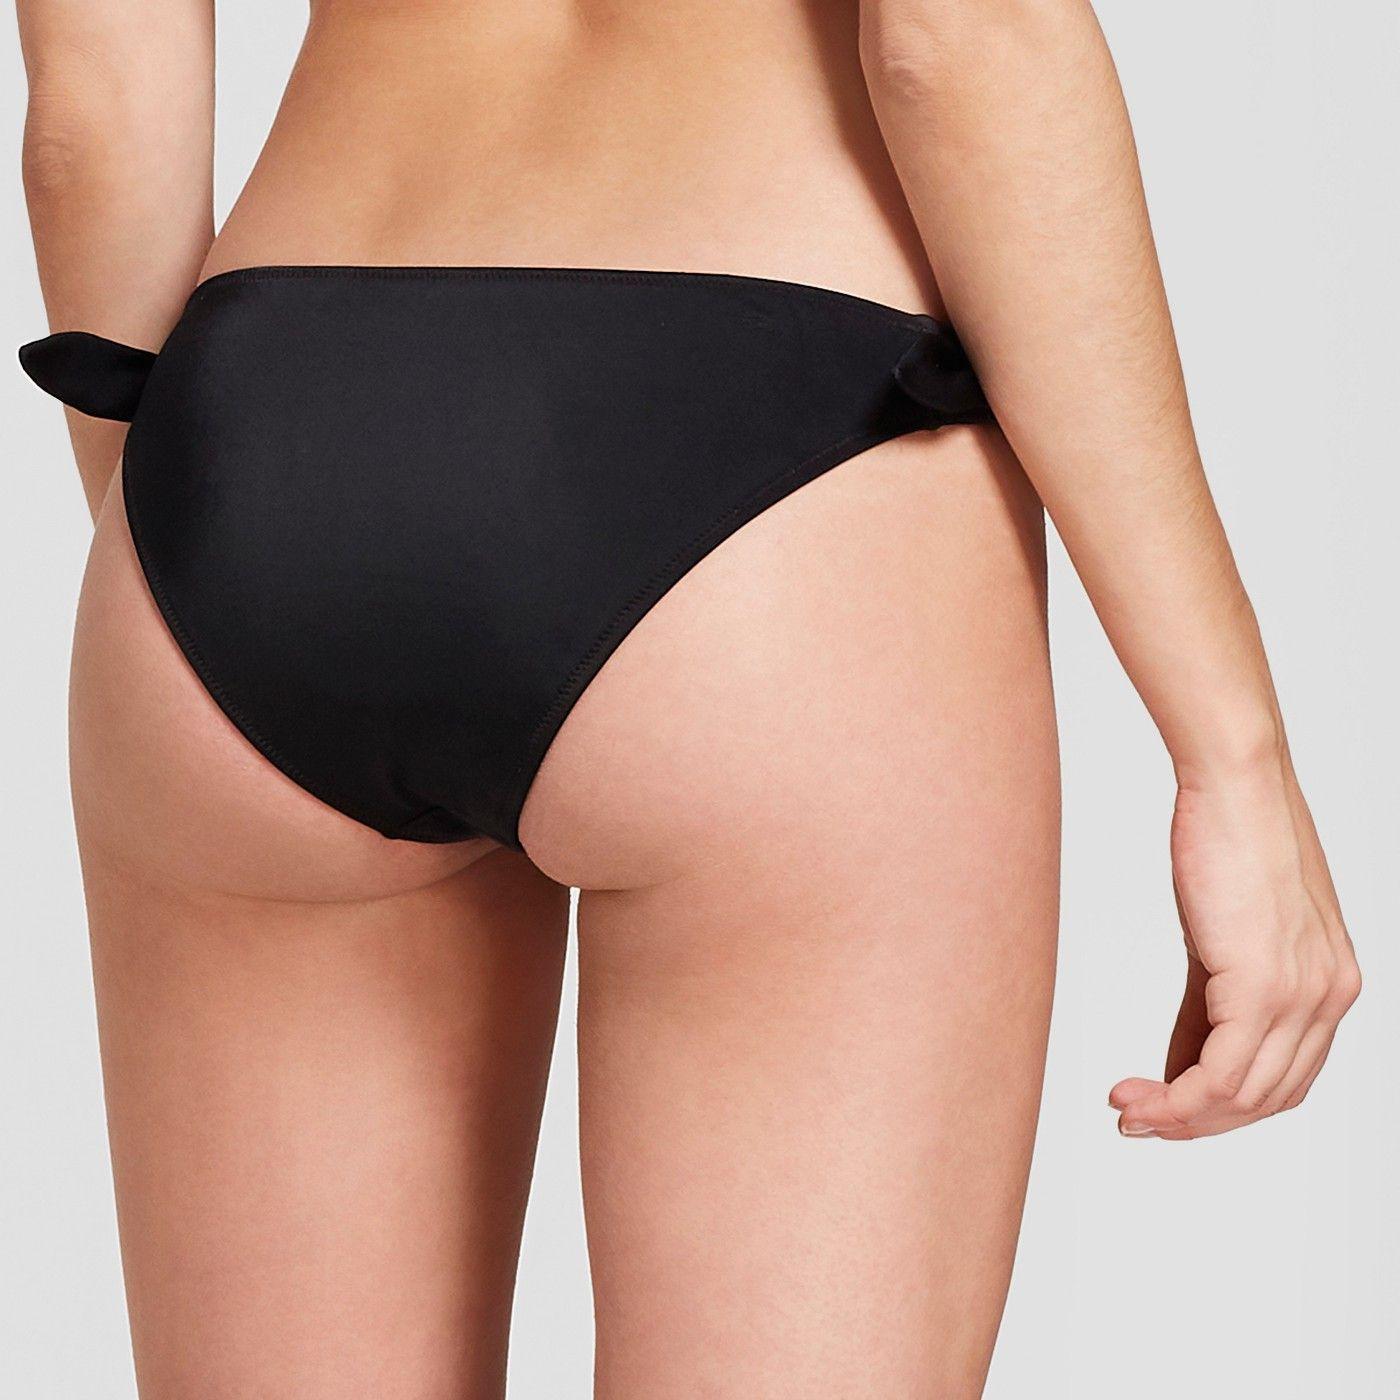 d1c6fe29fdbbb Women's Sun Coast Cheeky Tie Side Bikini Bottom - Shade | Street ...